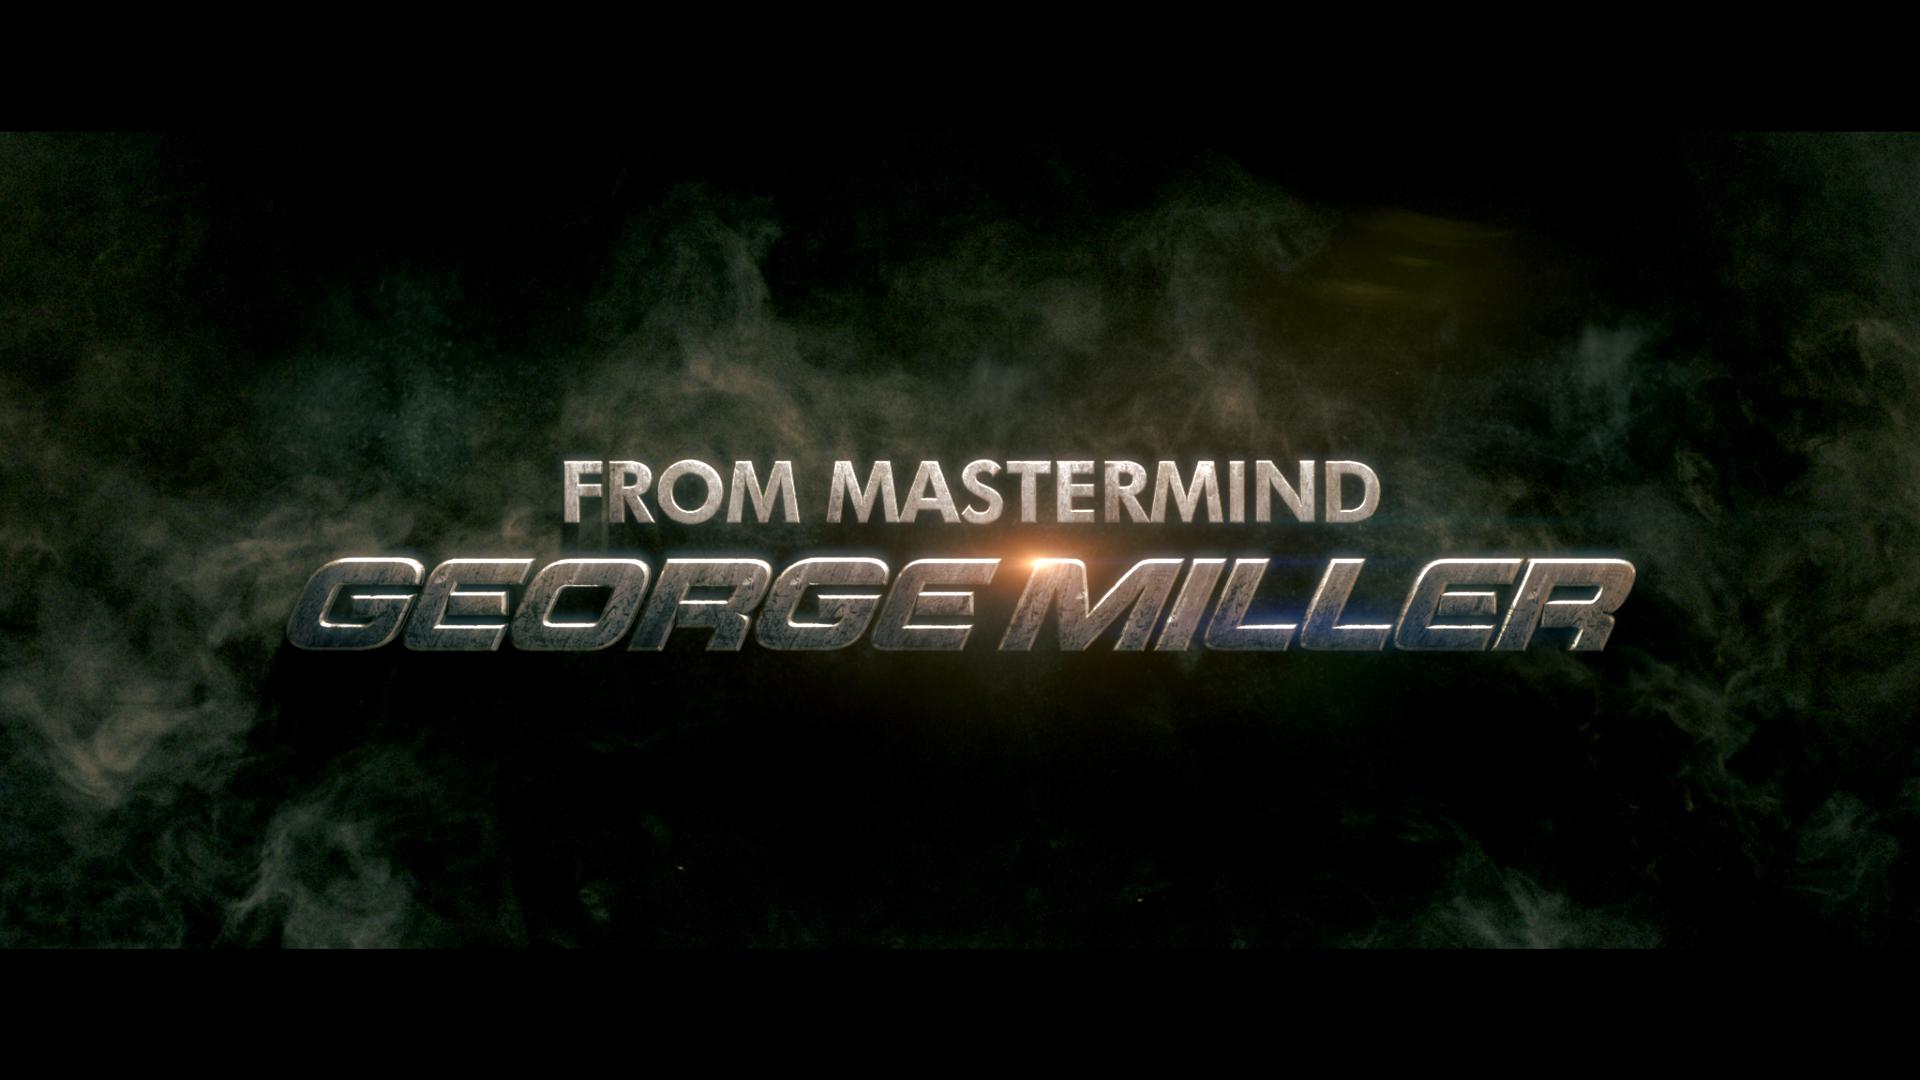 MAD_WB_Trl_v14_1_GeorgeMiller.jpg